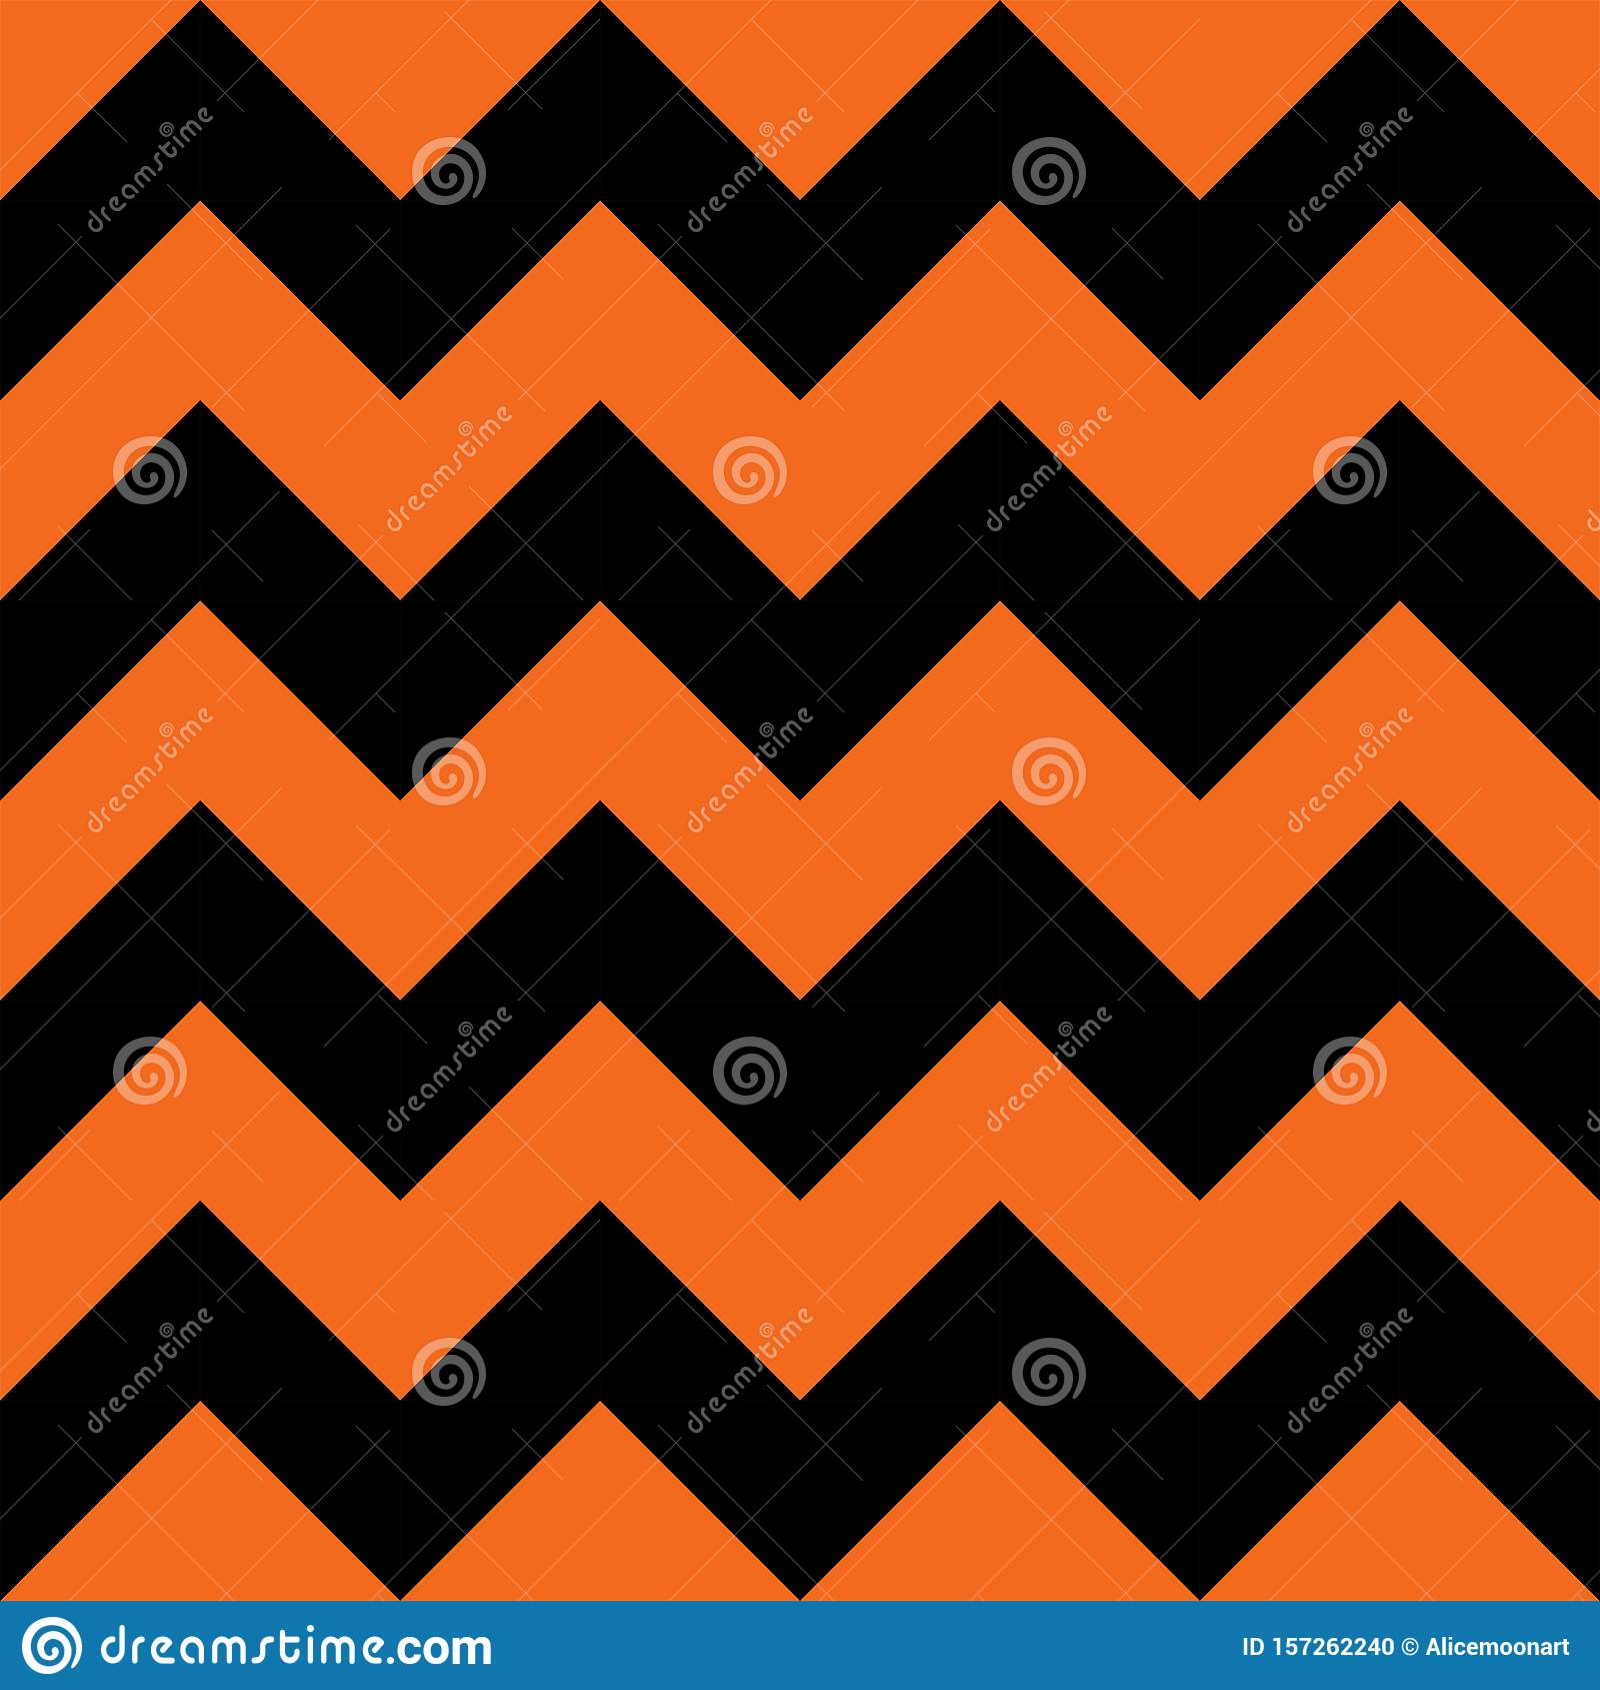 Halloween Orange and Black Chevron Seamless Pattern Background